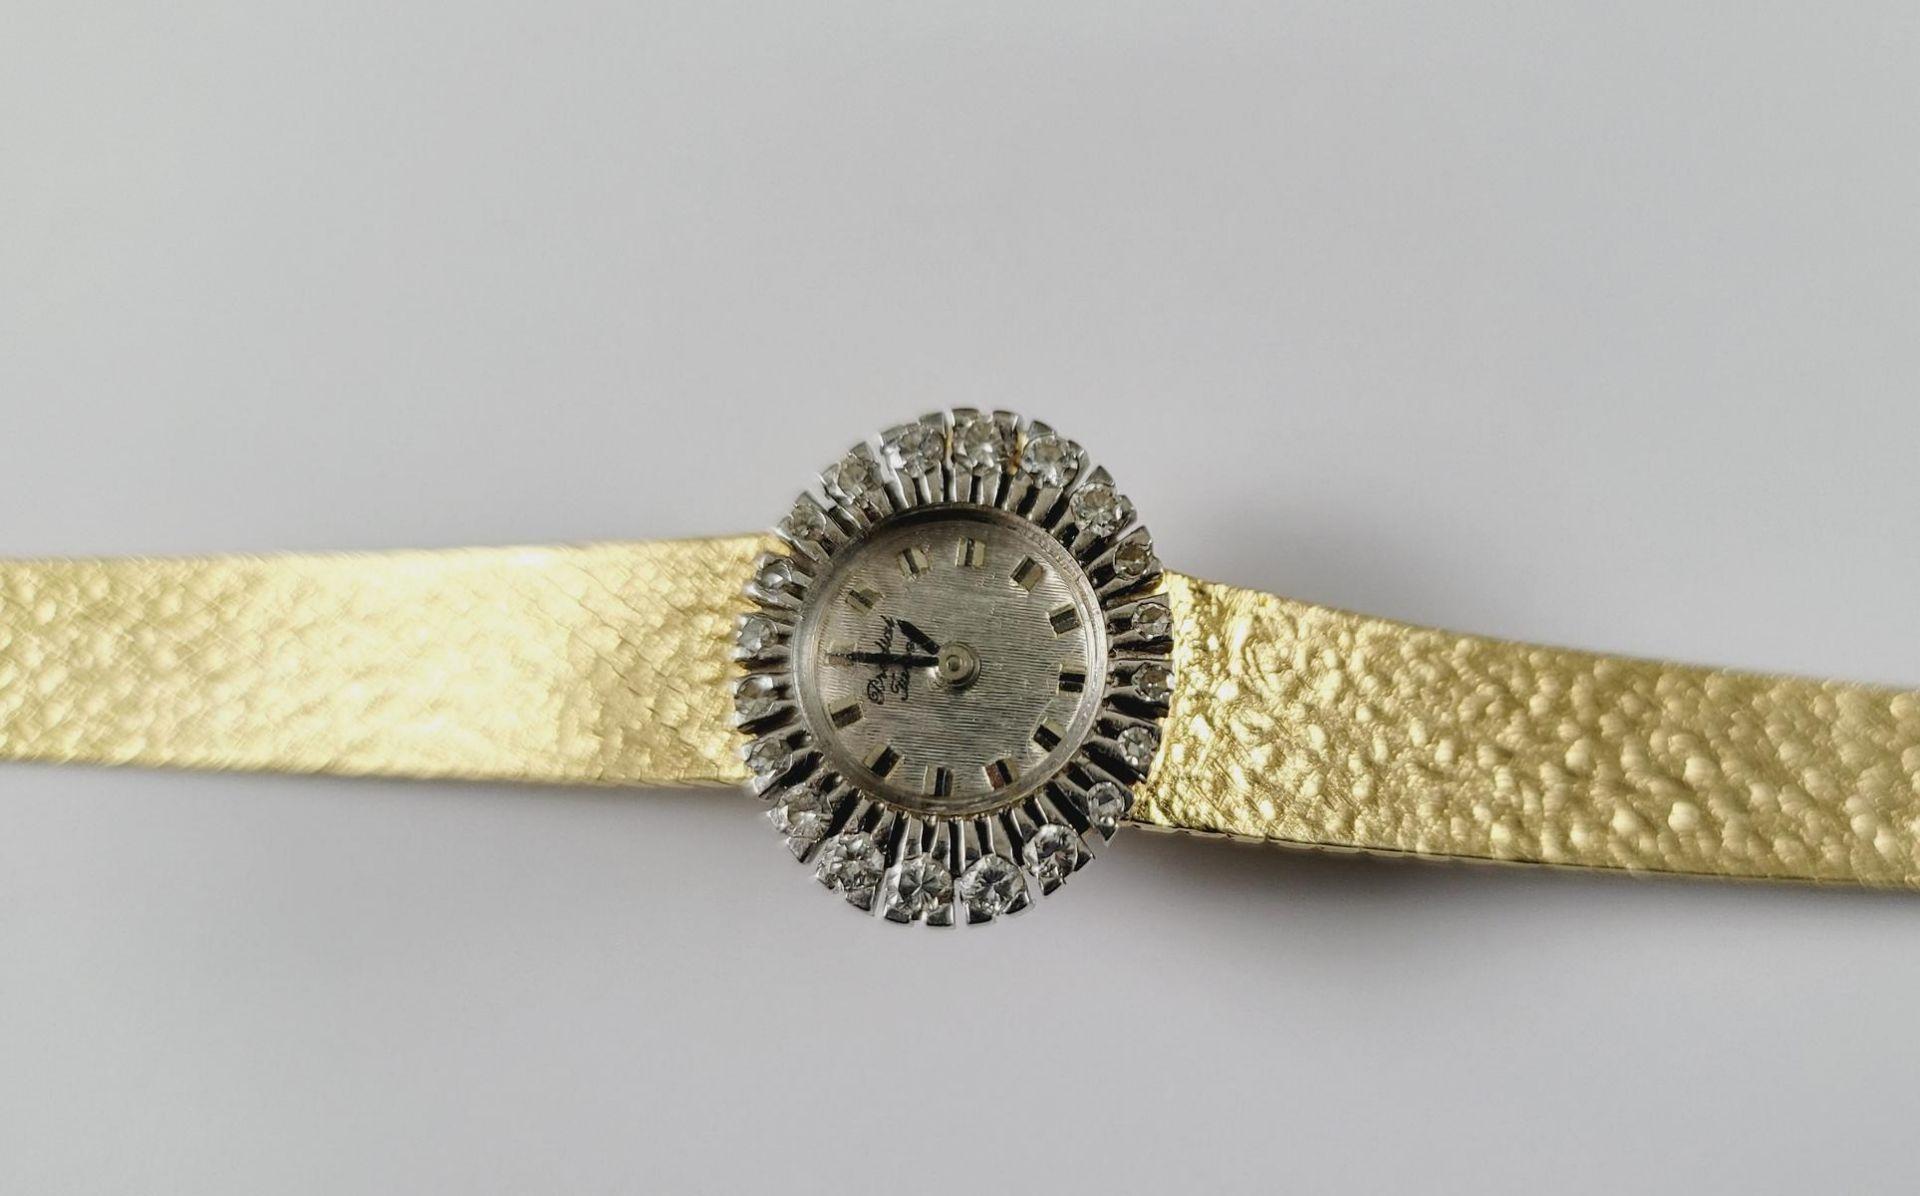 Damenarmbanduhr mit Diamanten, 18 Karat Gelbgold - Bild 2 aus 4